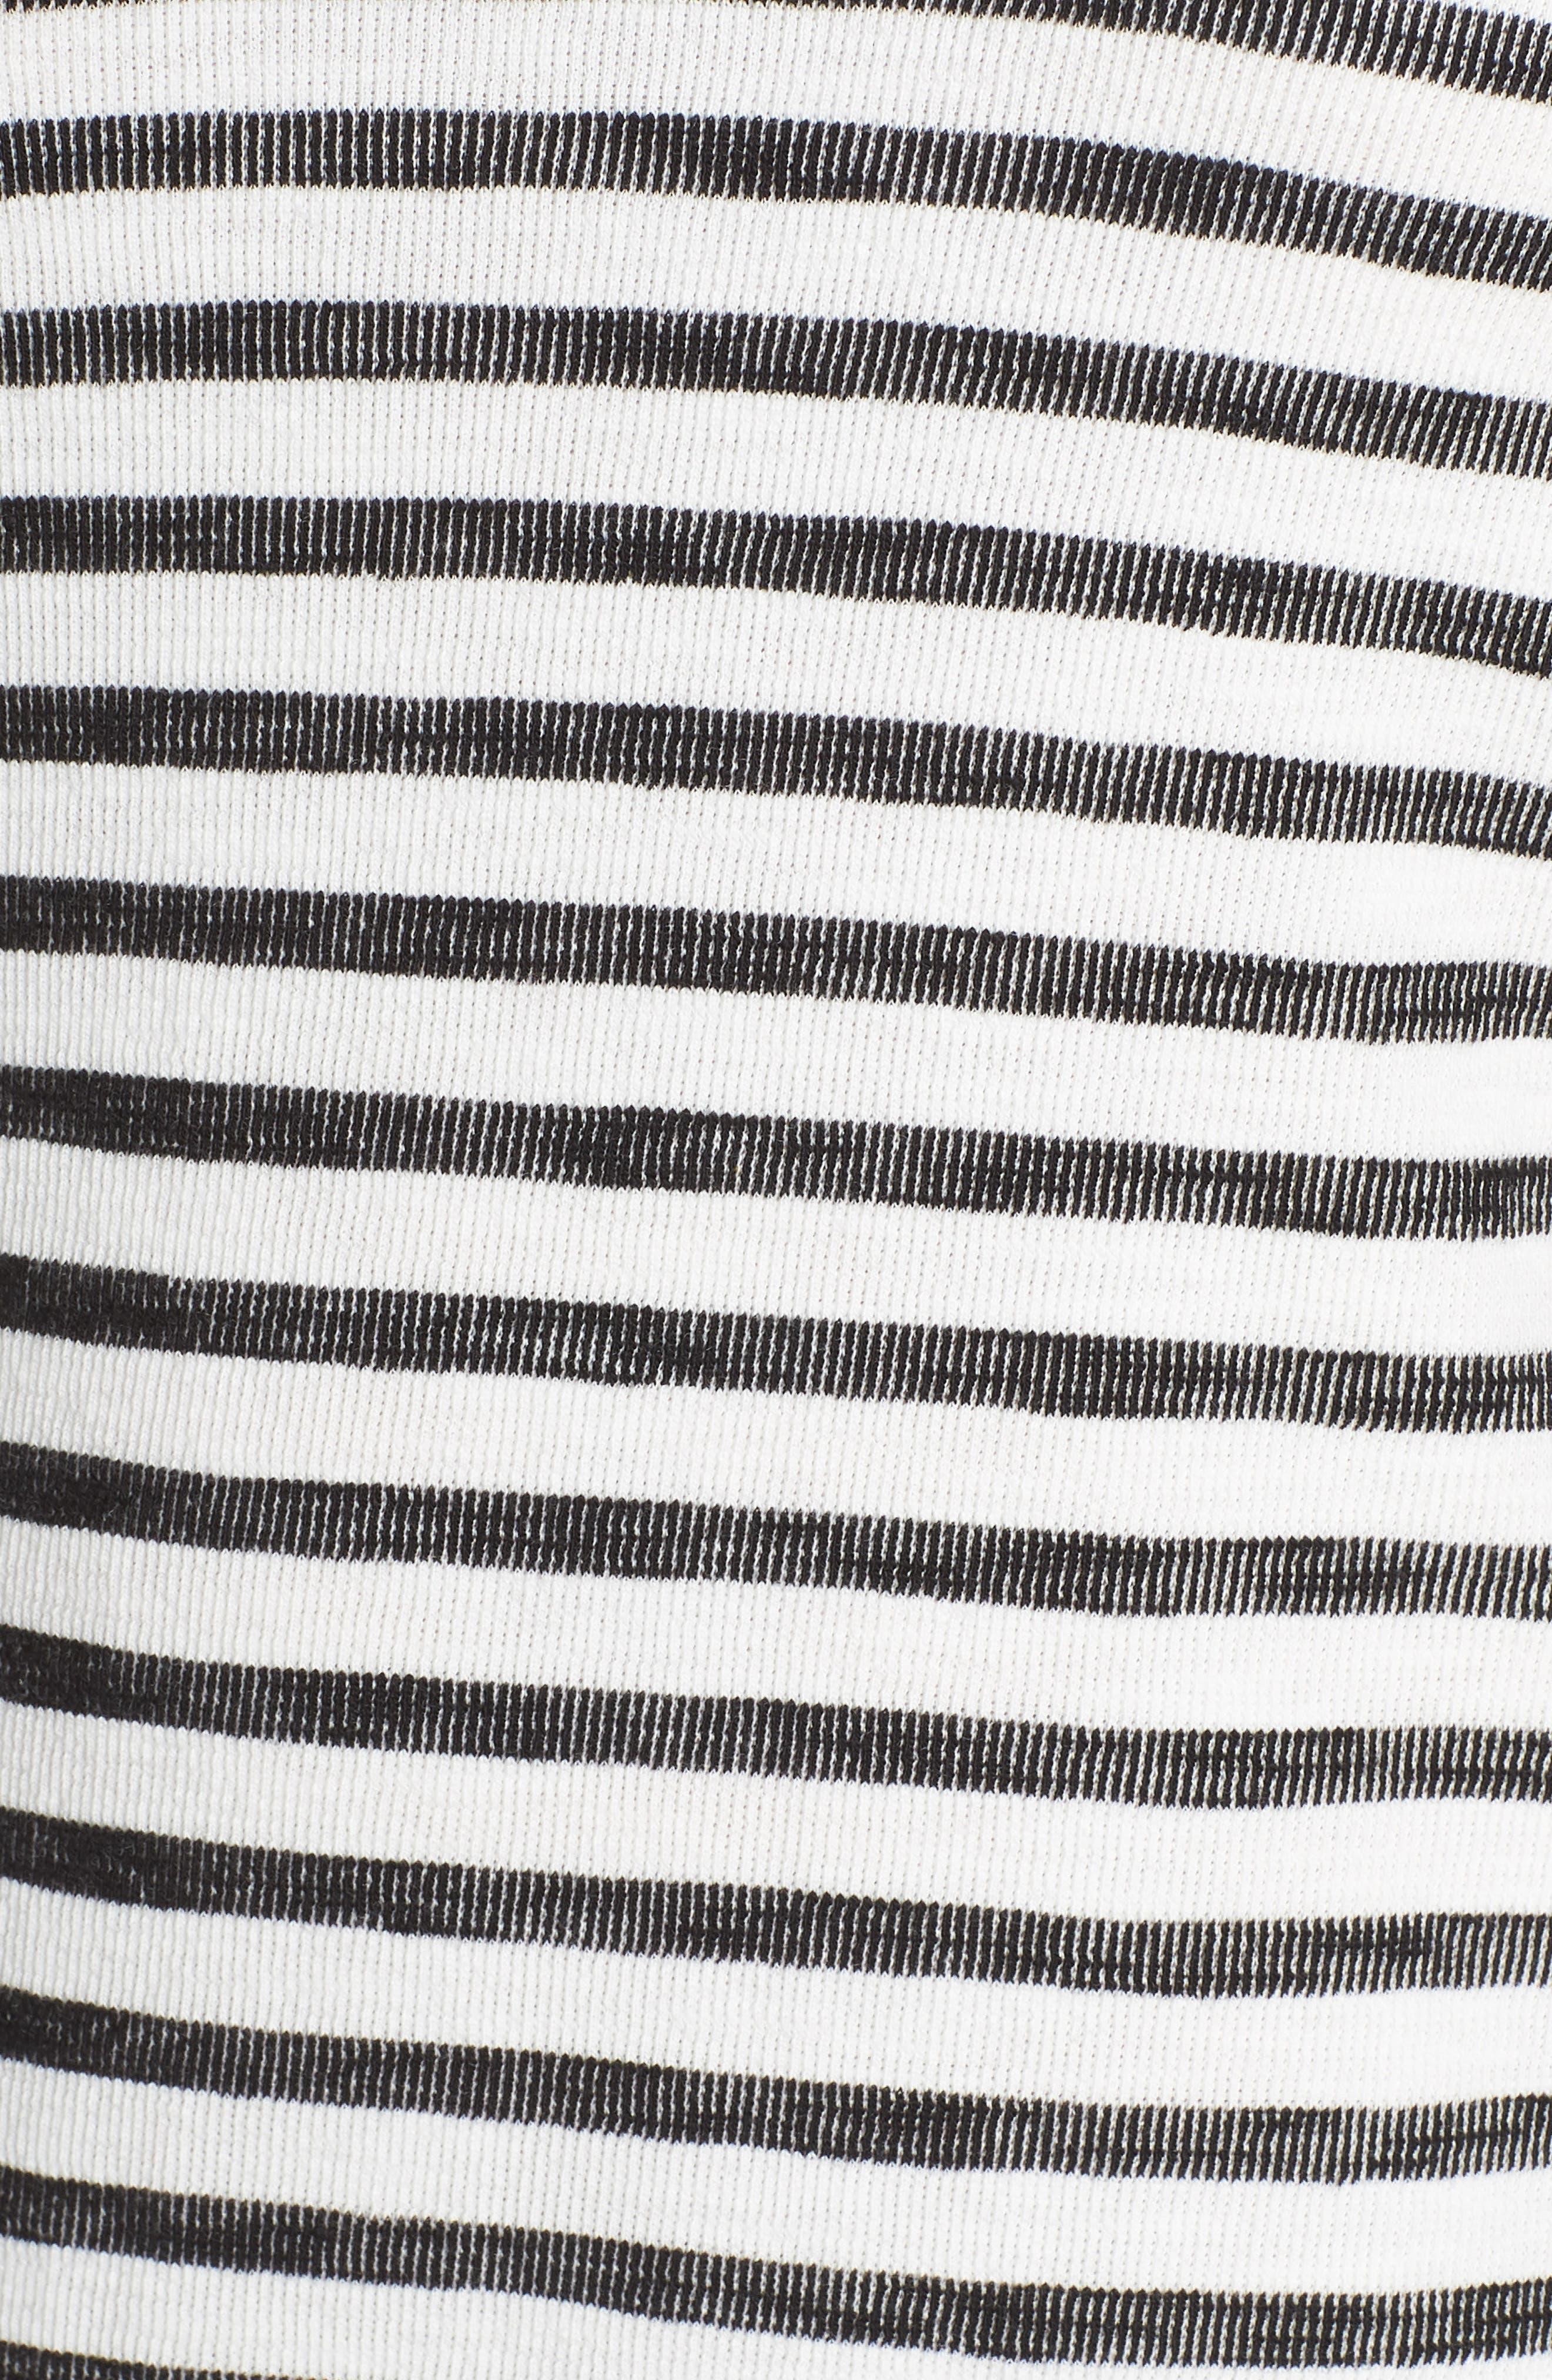 Button Back Knit Dress,                             Alternate thumbnail 6, color,                             901